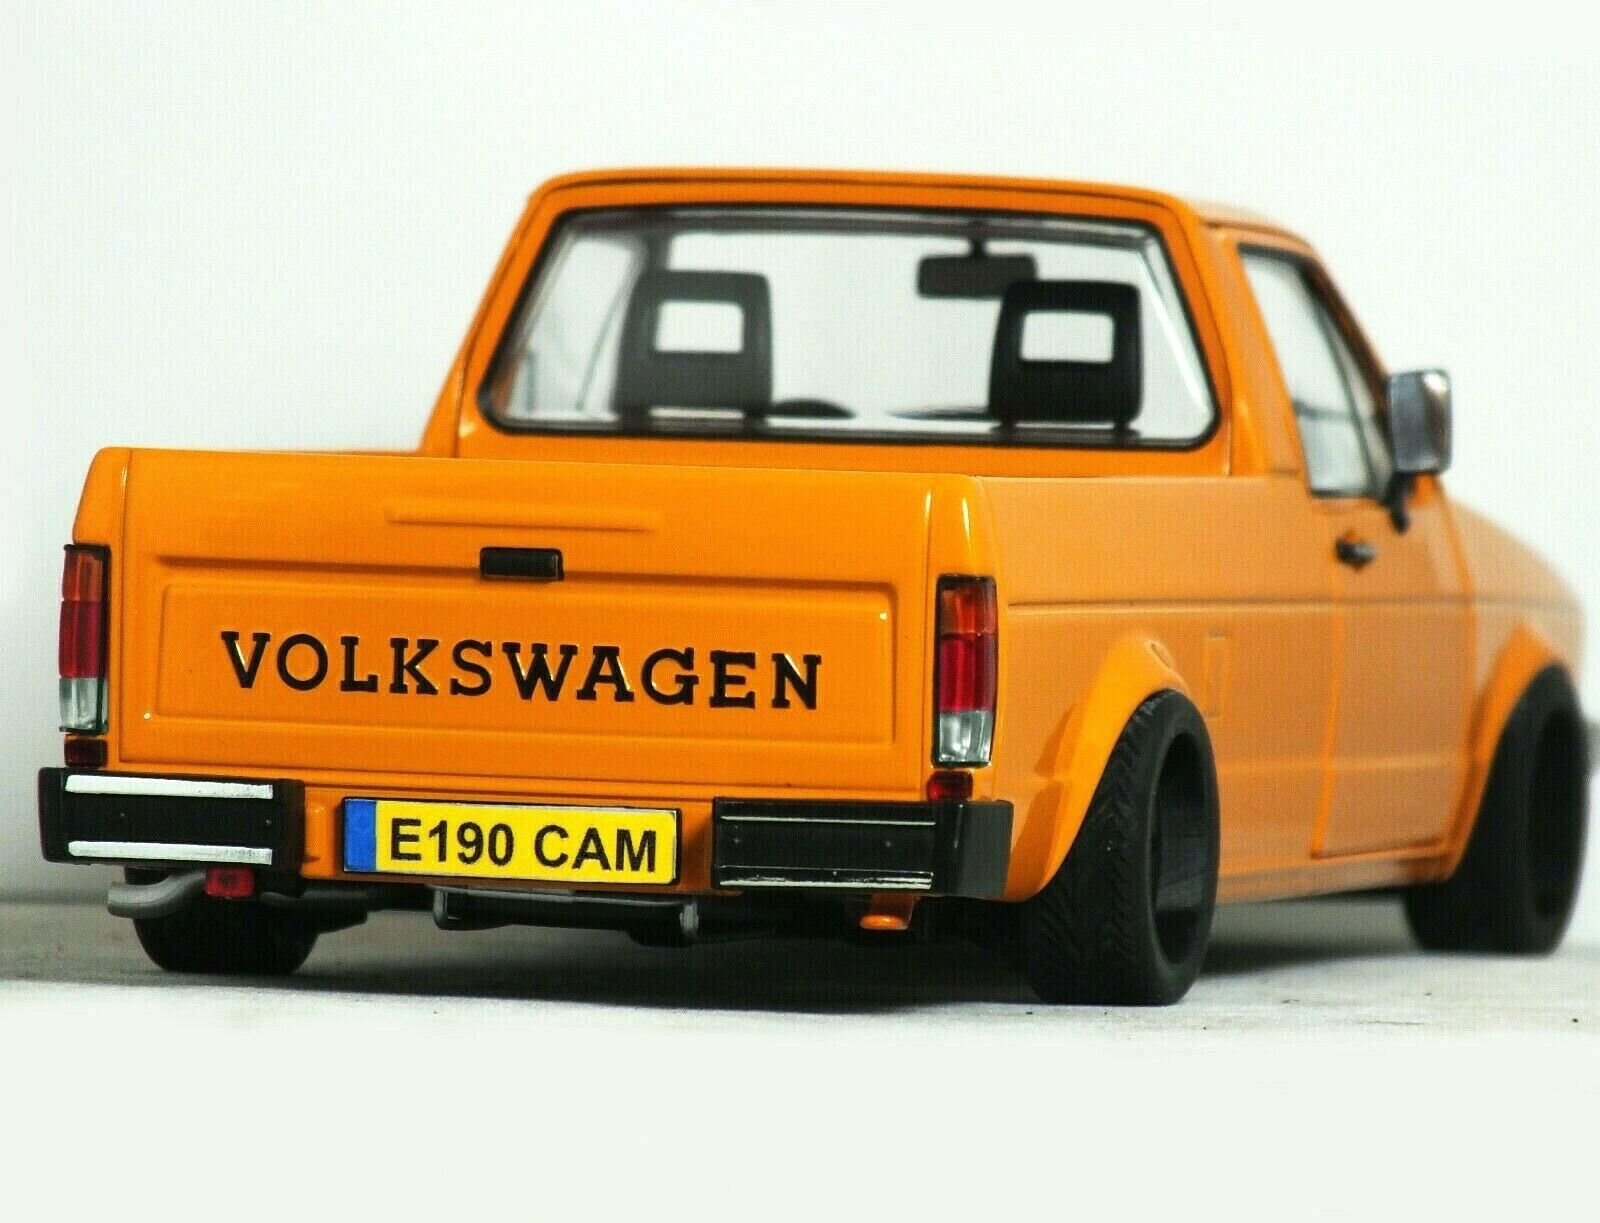 1 18 Otto Mk1 Volkswagen Caddy Vr6 Pick Up Modified Tuning Umbau Vw Golf Gti 16v For Sale Online Ebay